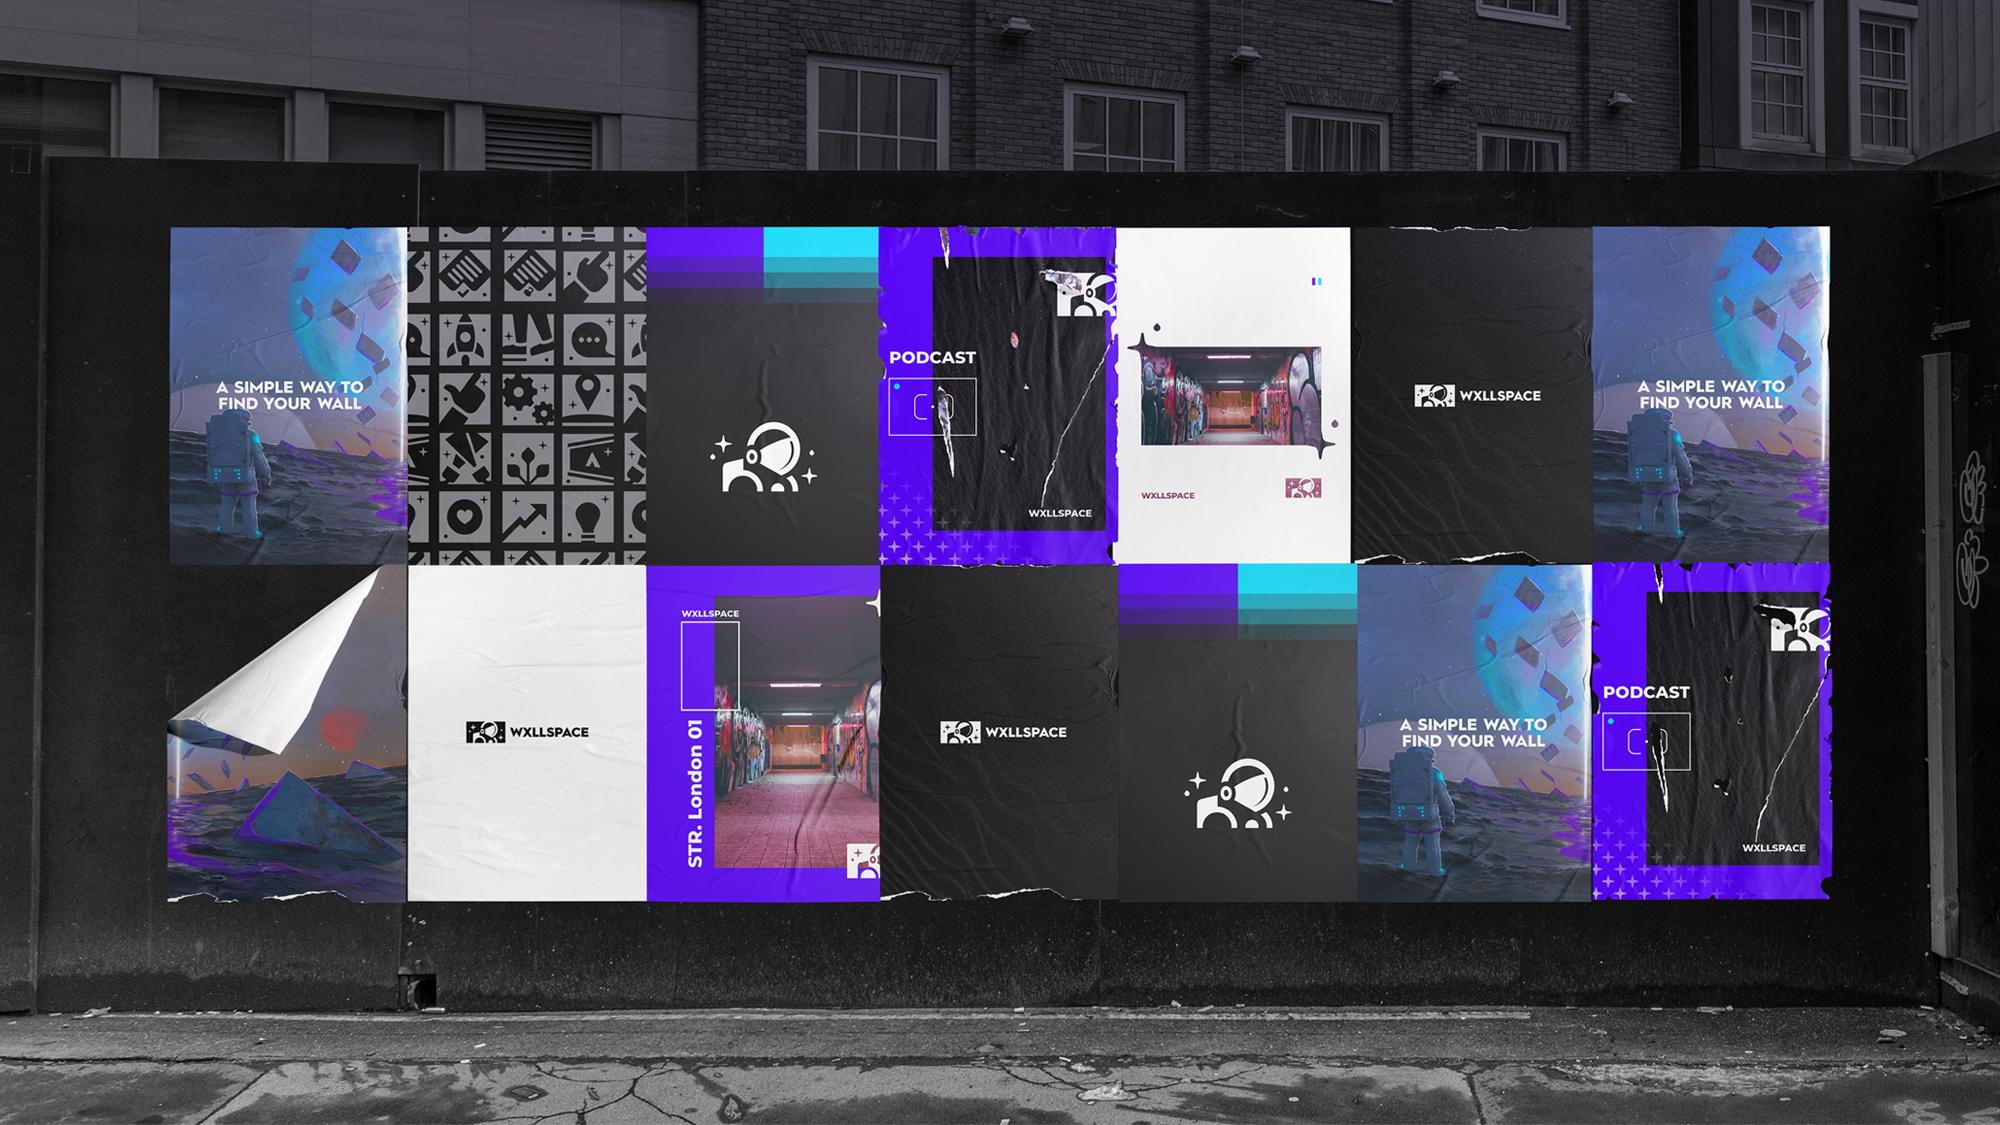 Wxllspace posters